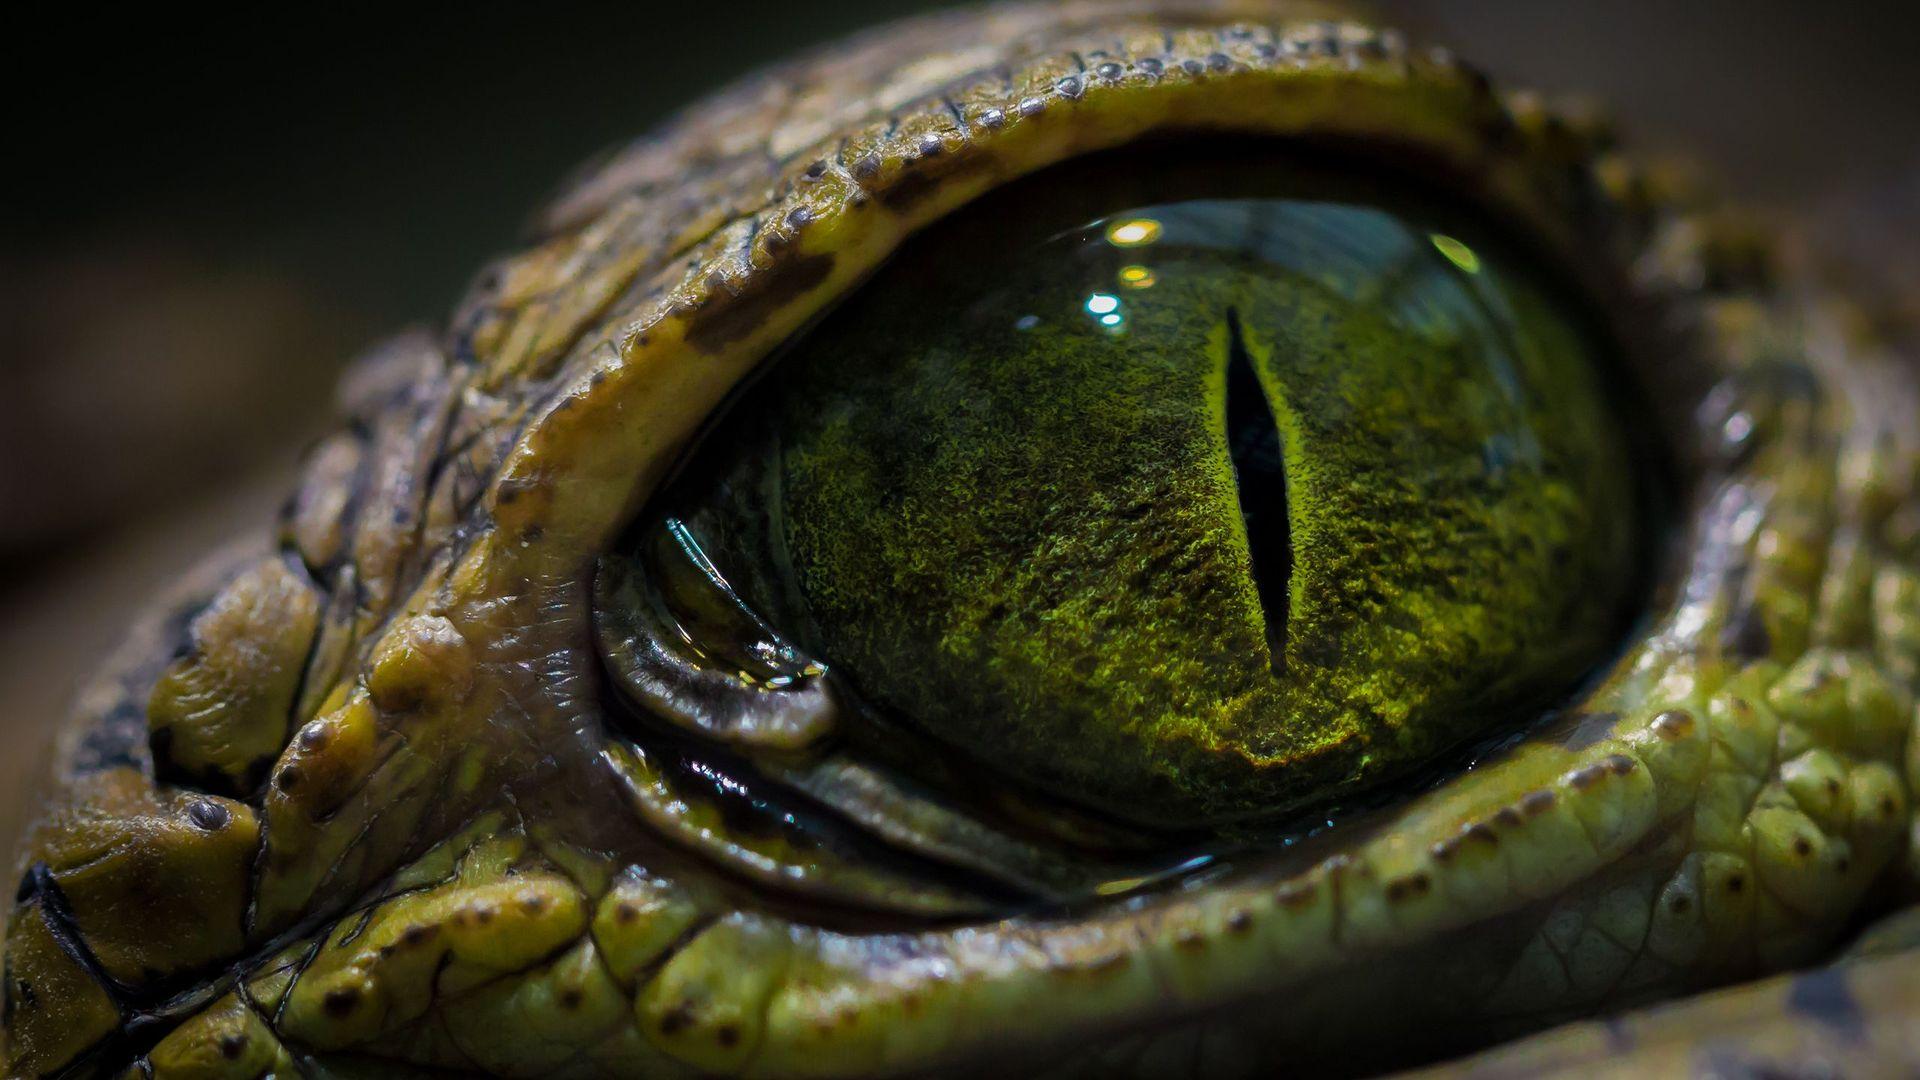 Crocodile eye wallpaper 17361 1920x1080